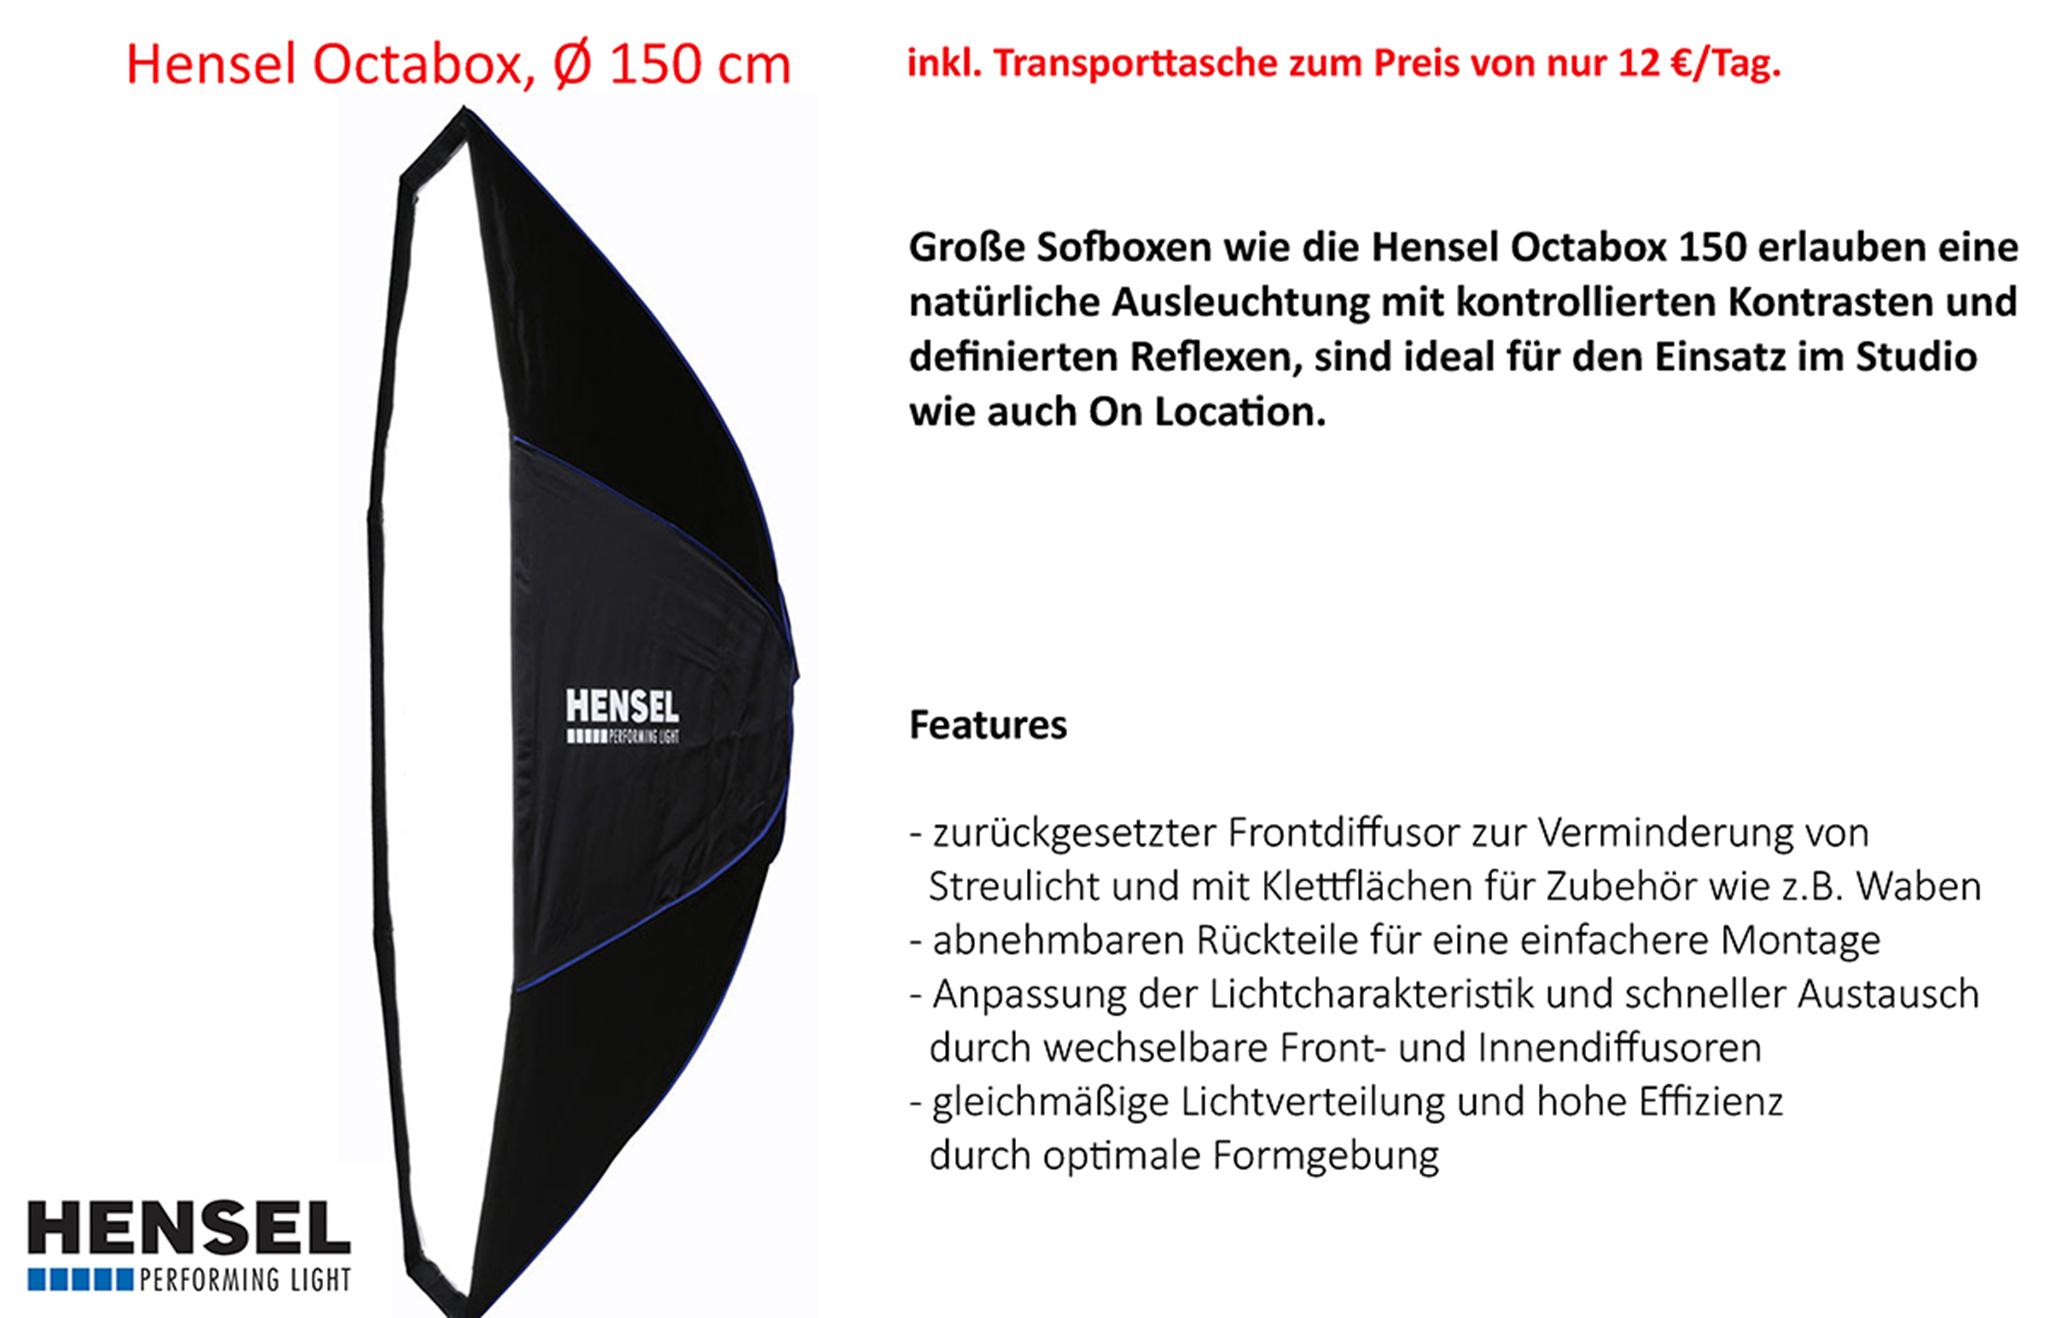 Hensel Octabox 150cm